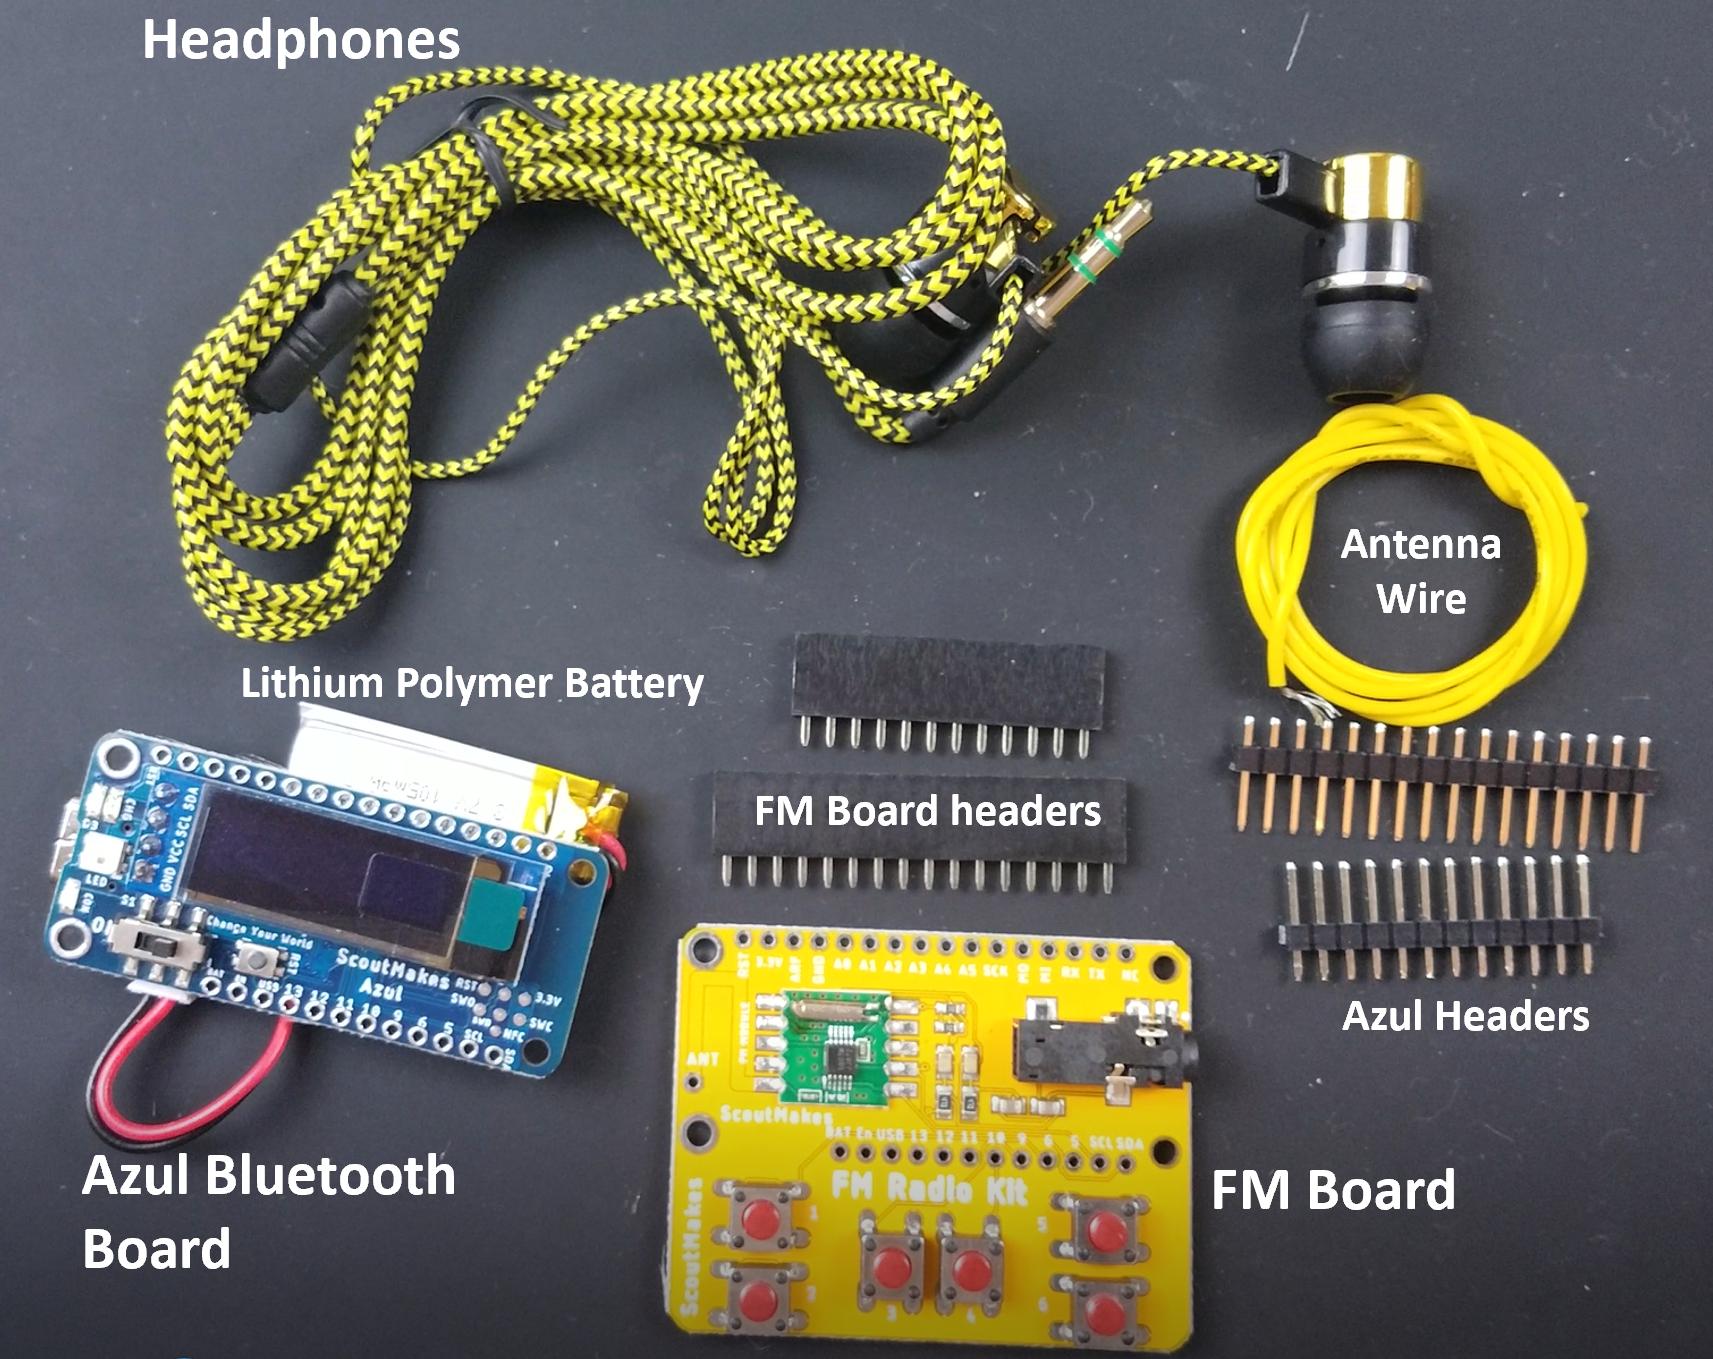 circuitpython_FM_layout.png